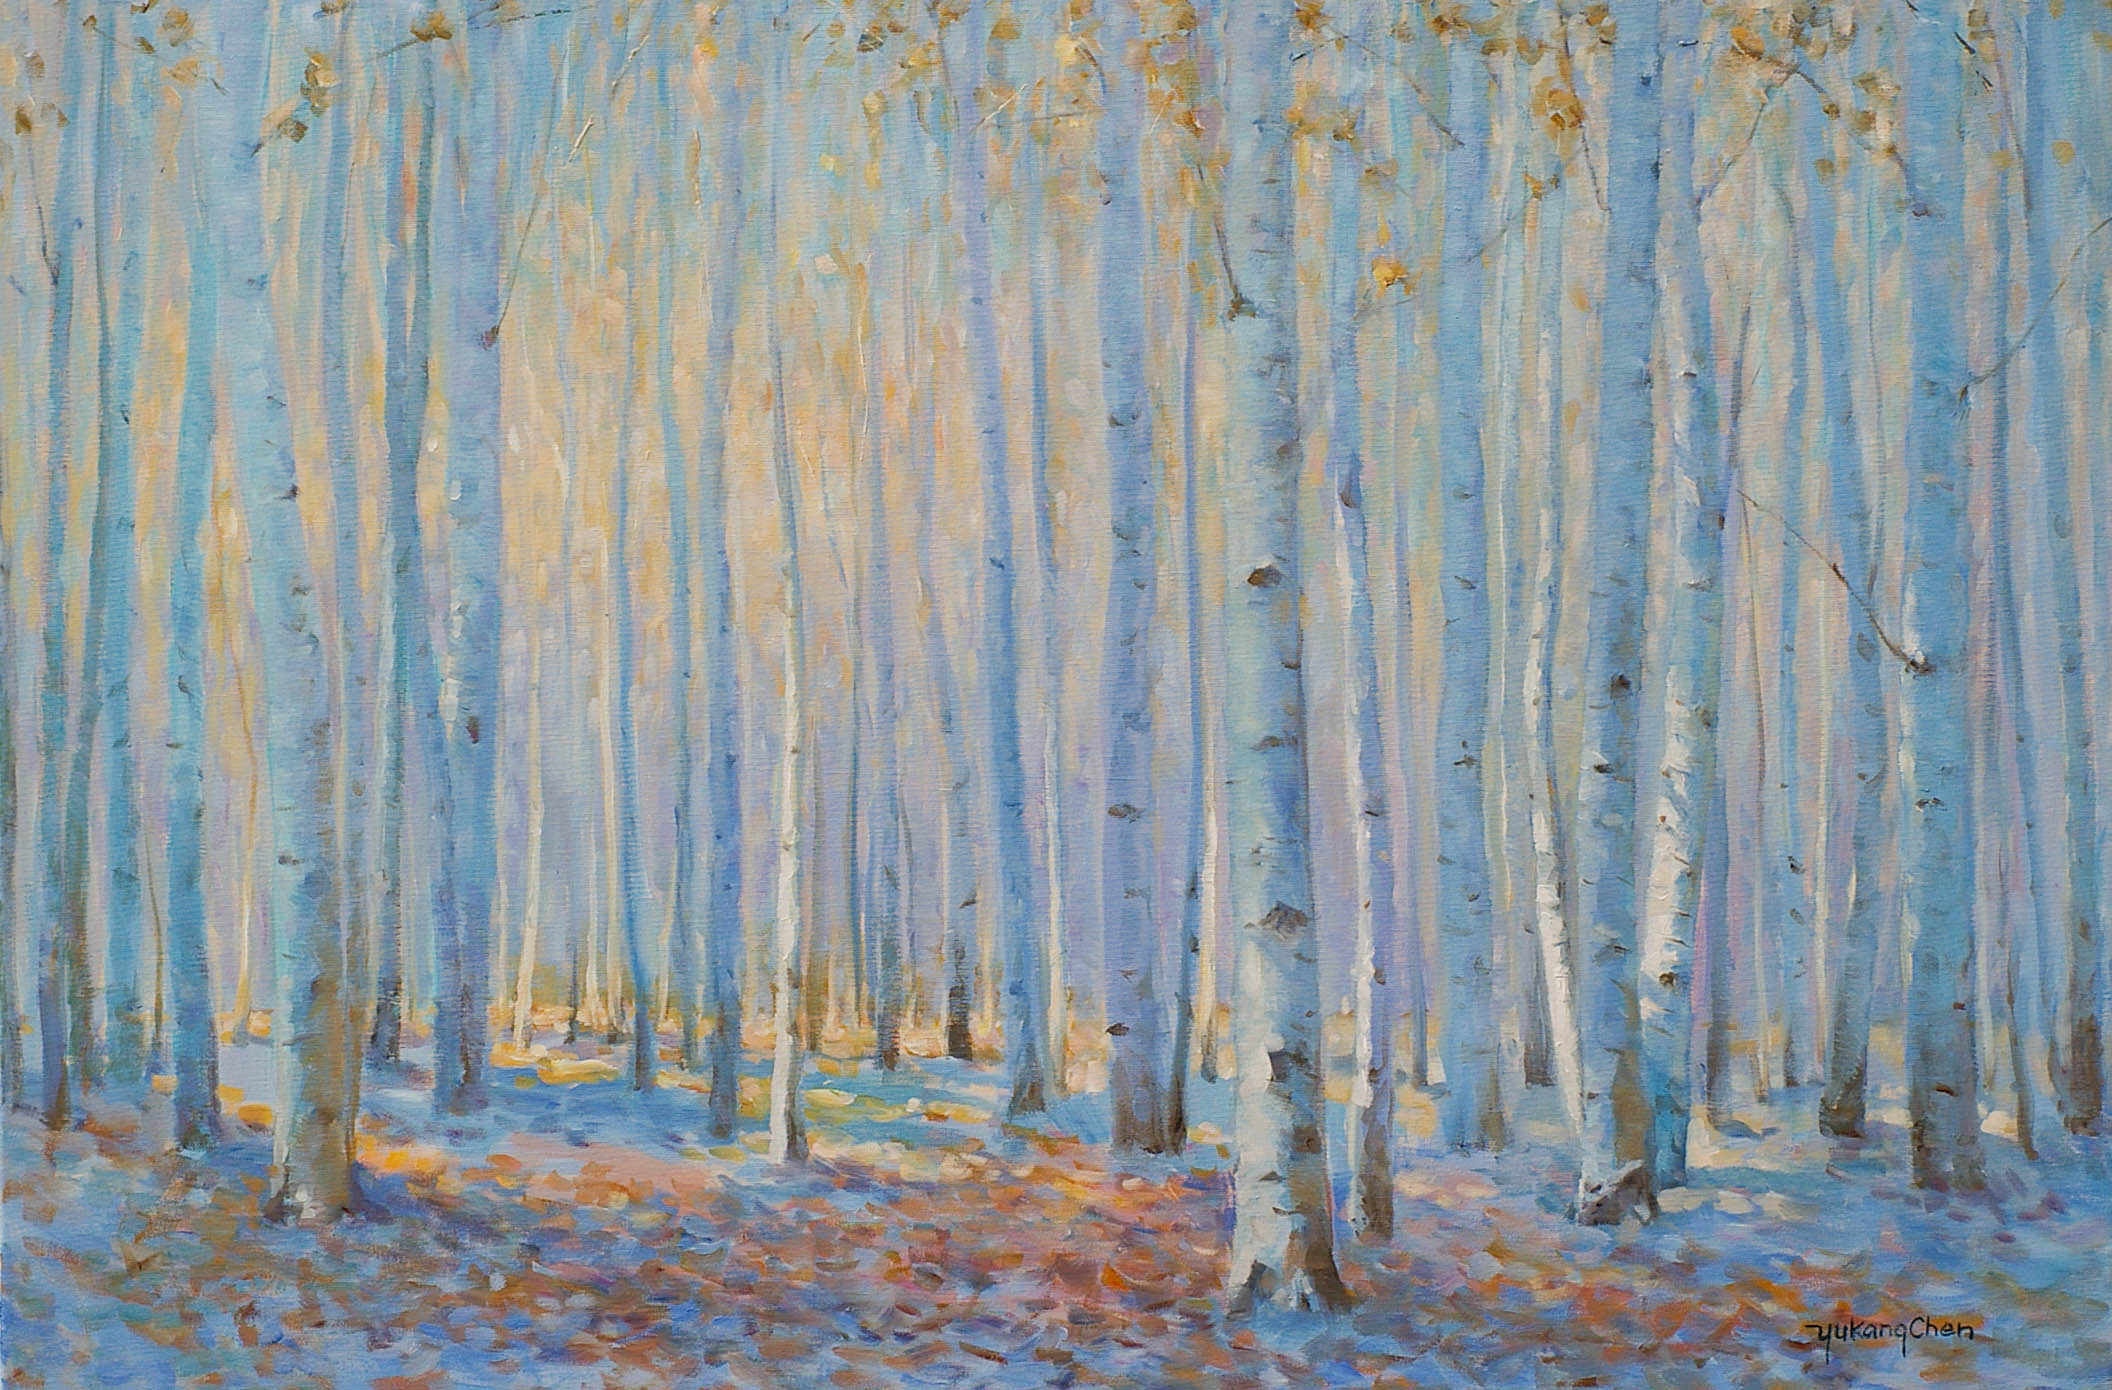 In October - Birch Forest